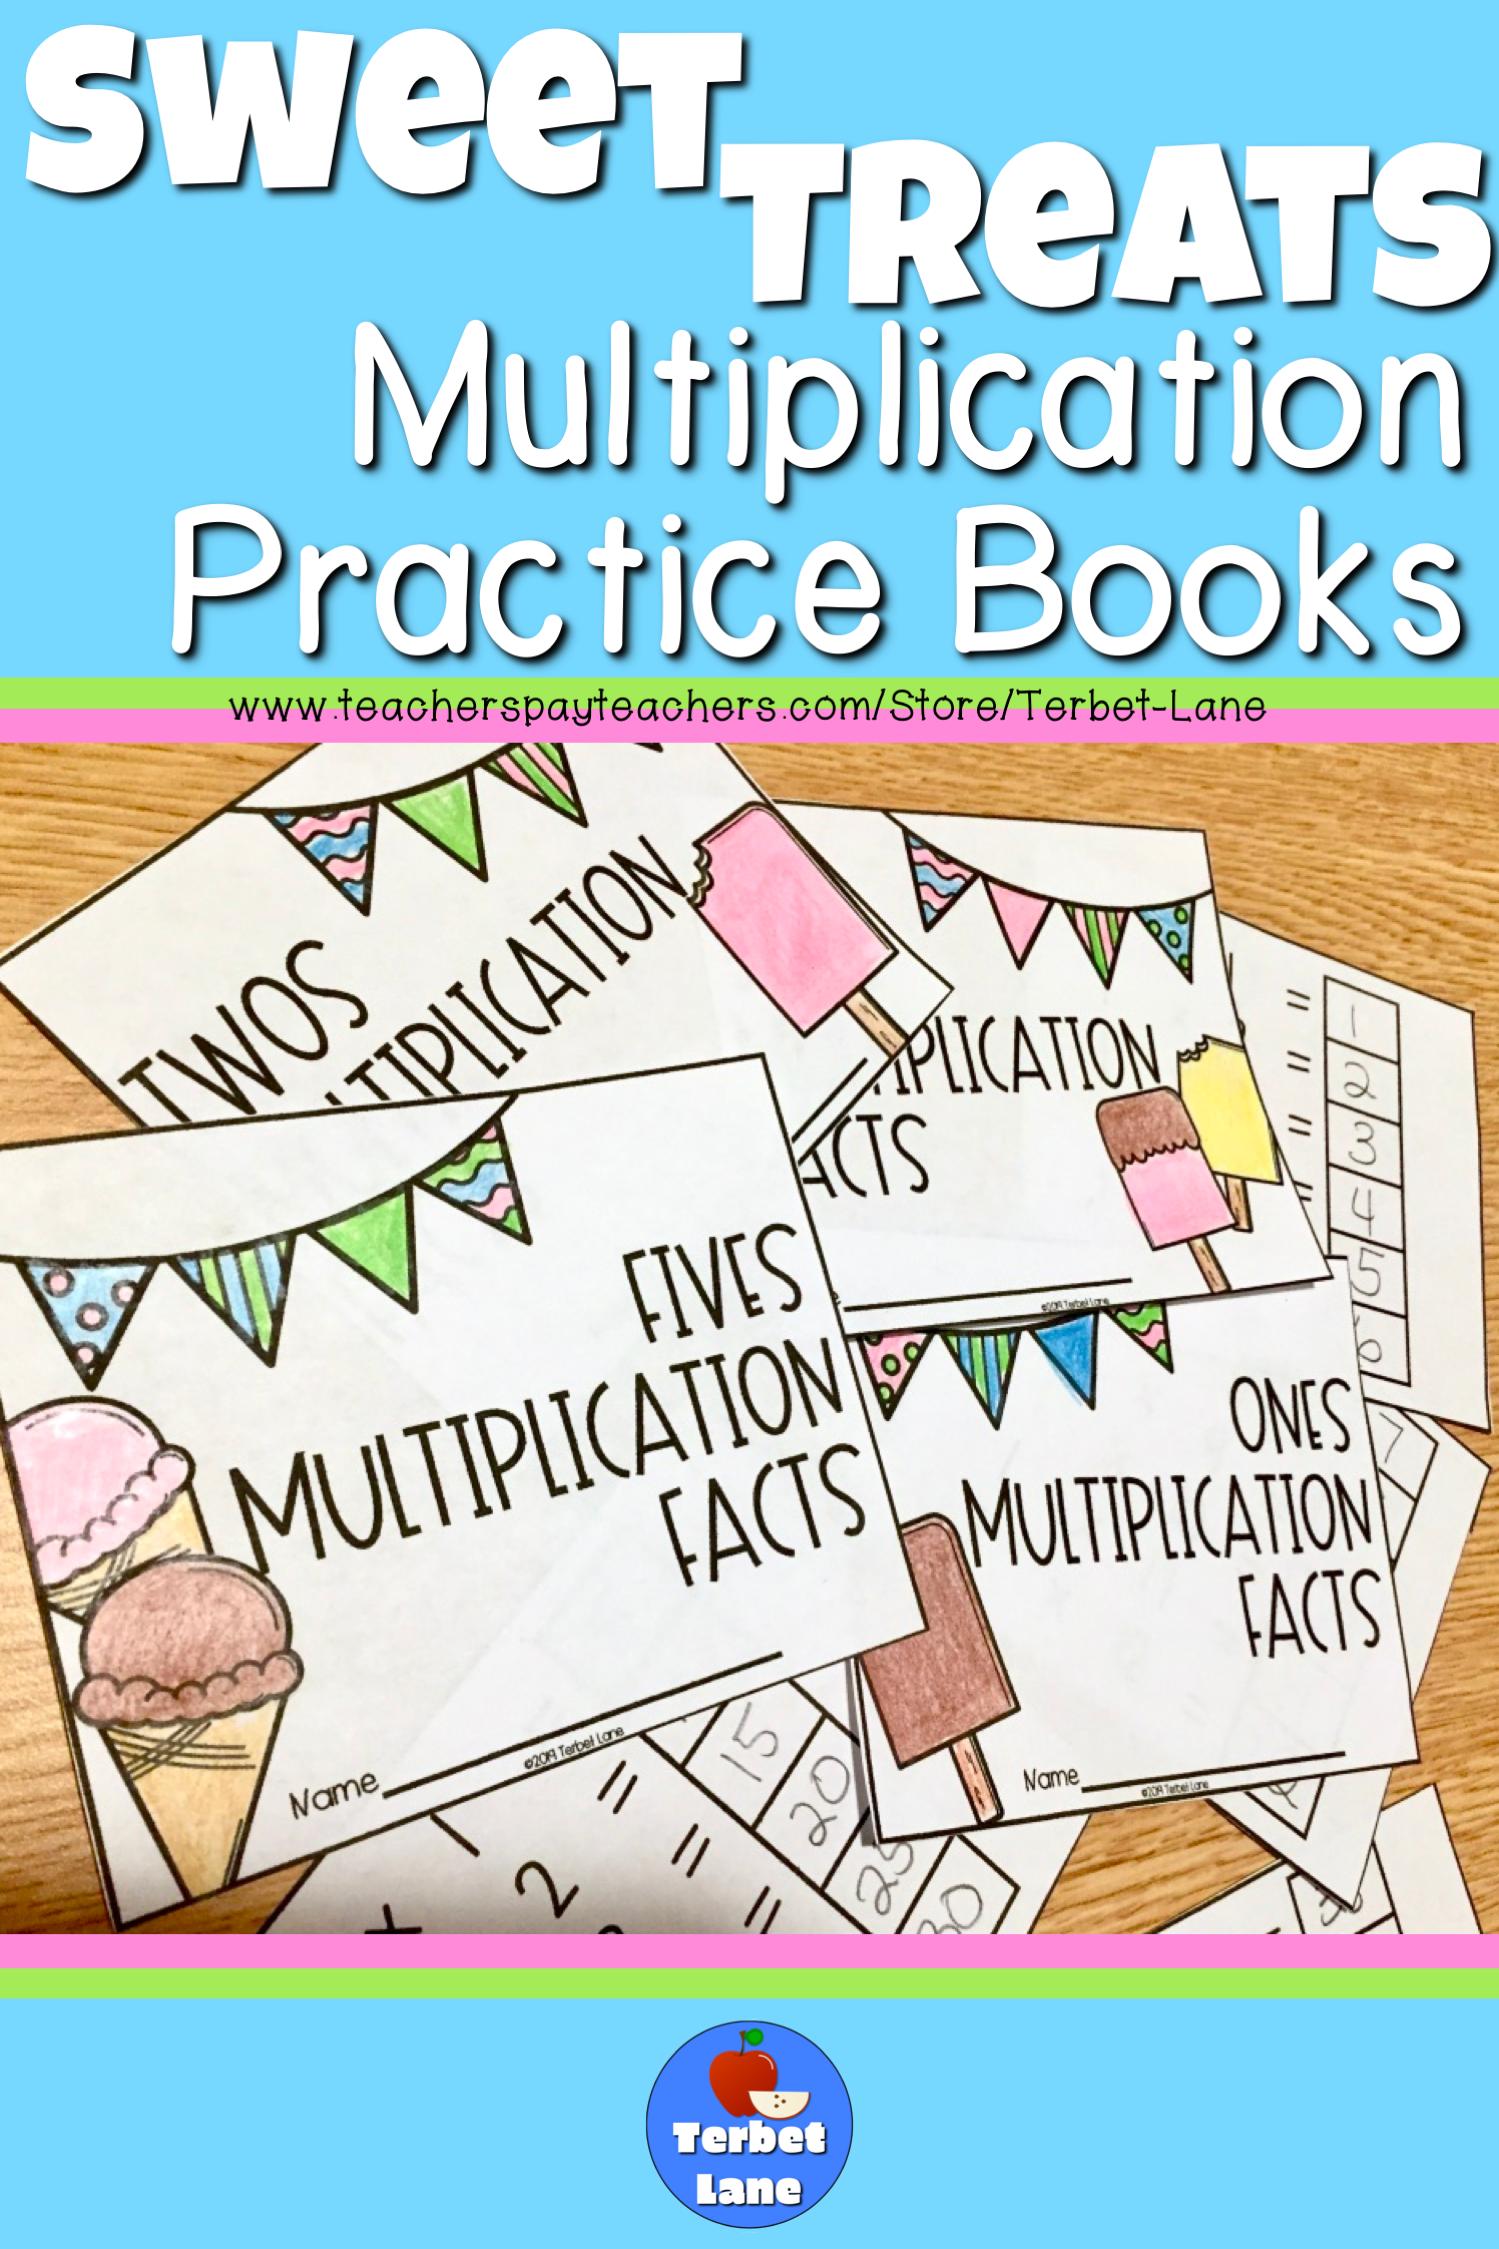 Sweet Treats Multiplication Facts